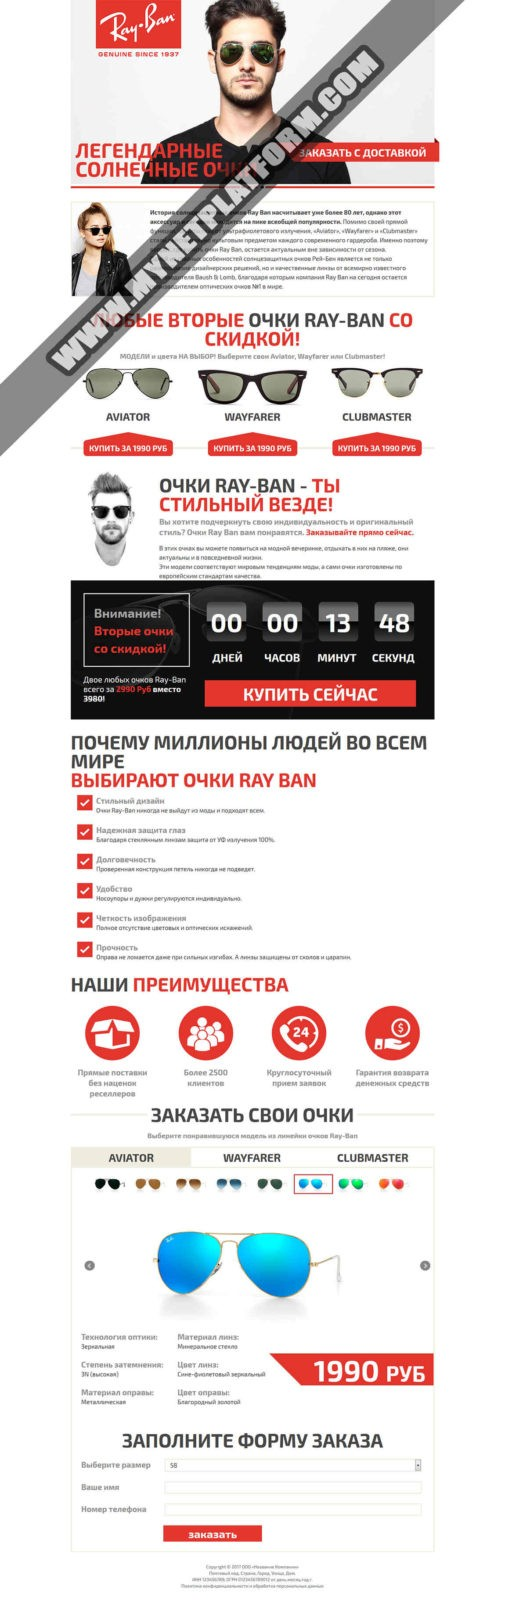 Скриншот Готового лендинга Очки Ray Ban 002